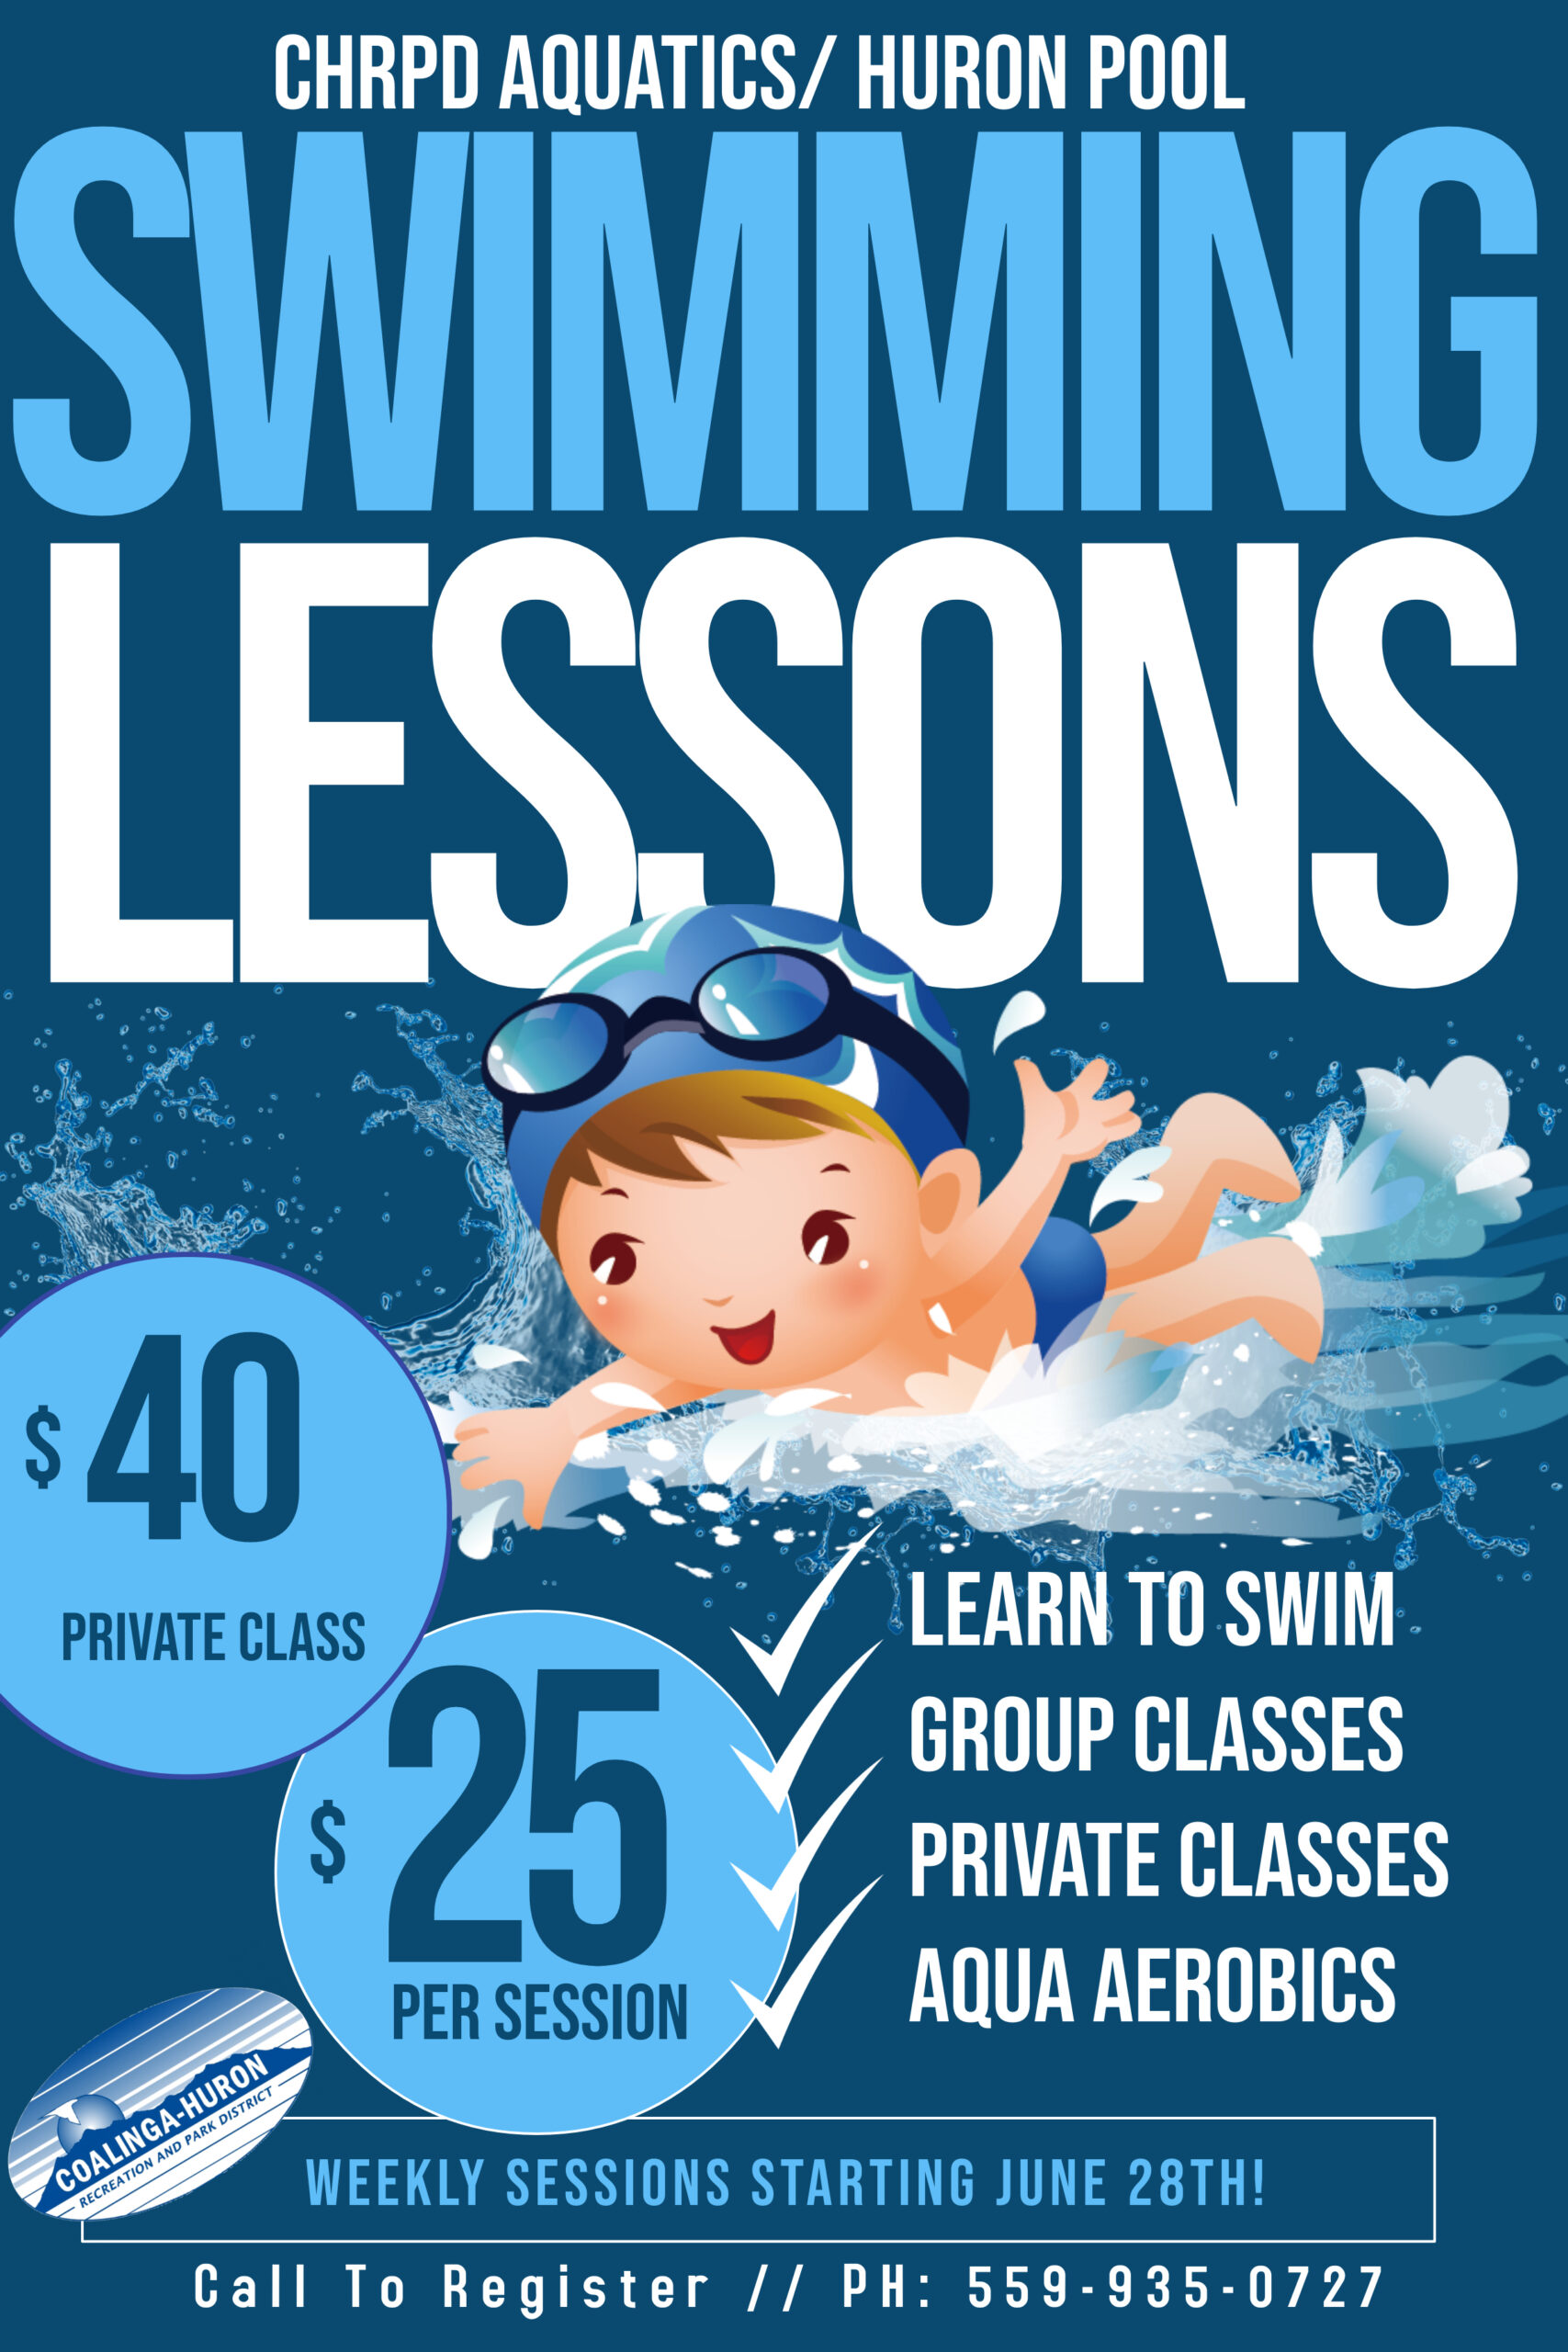 CHRPD Swimming Lesson Flyer 2021 HURON